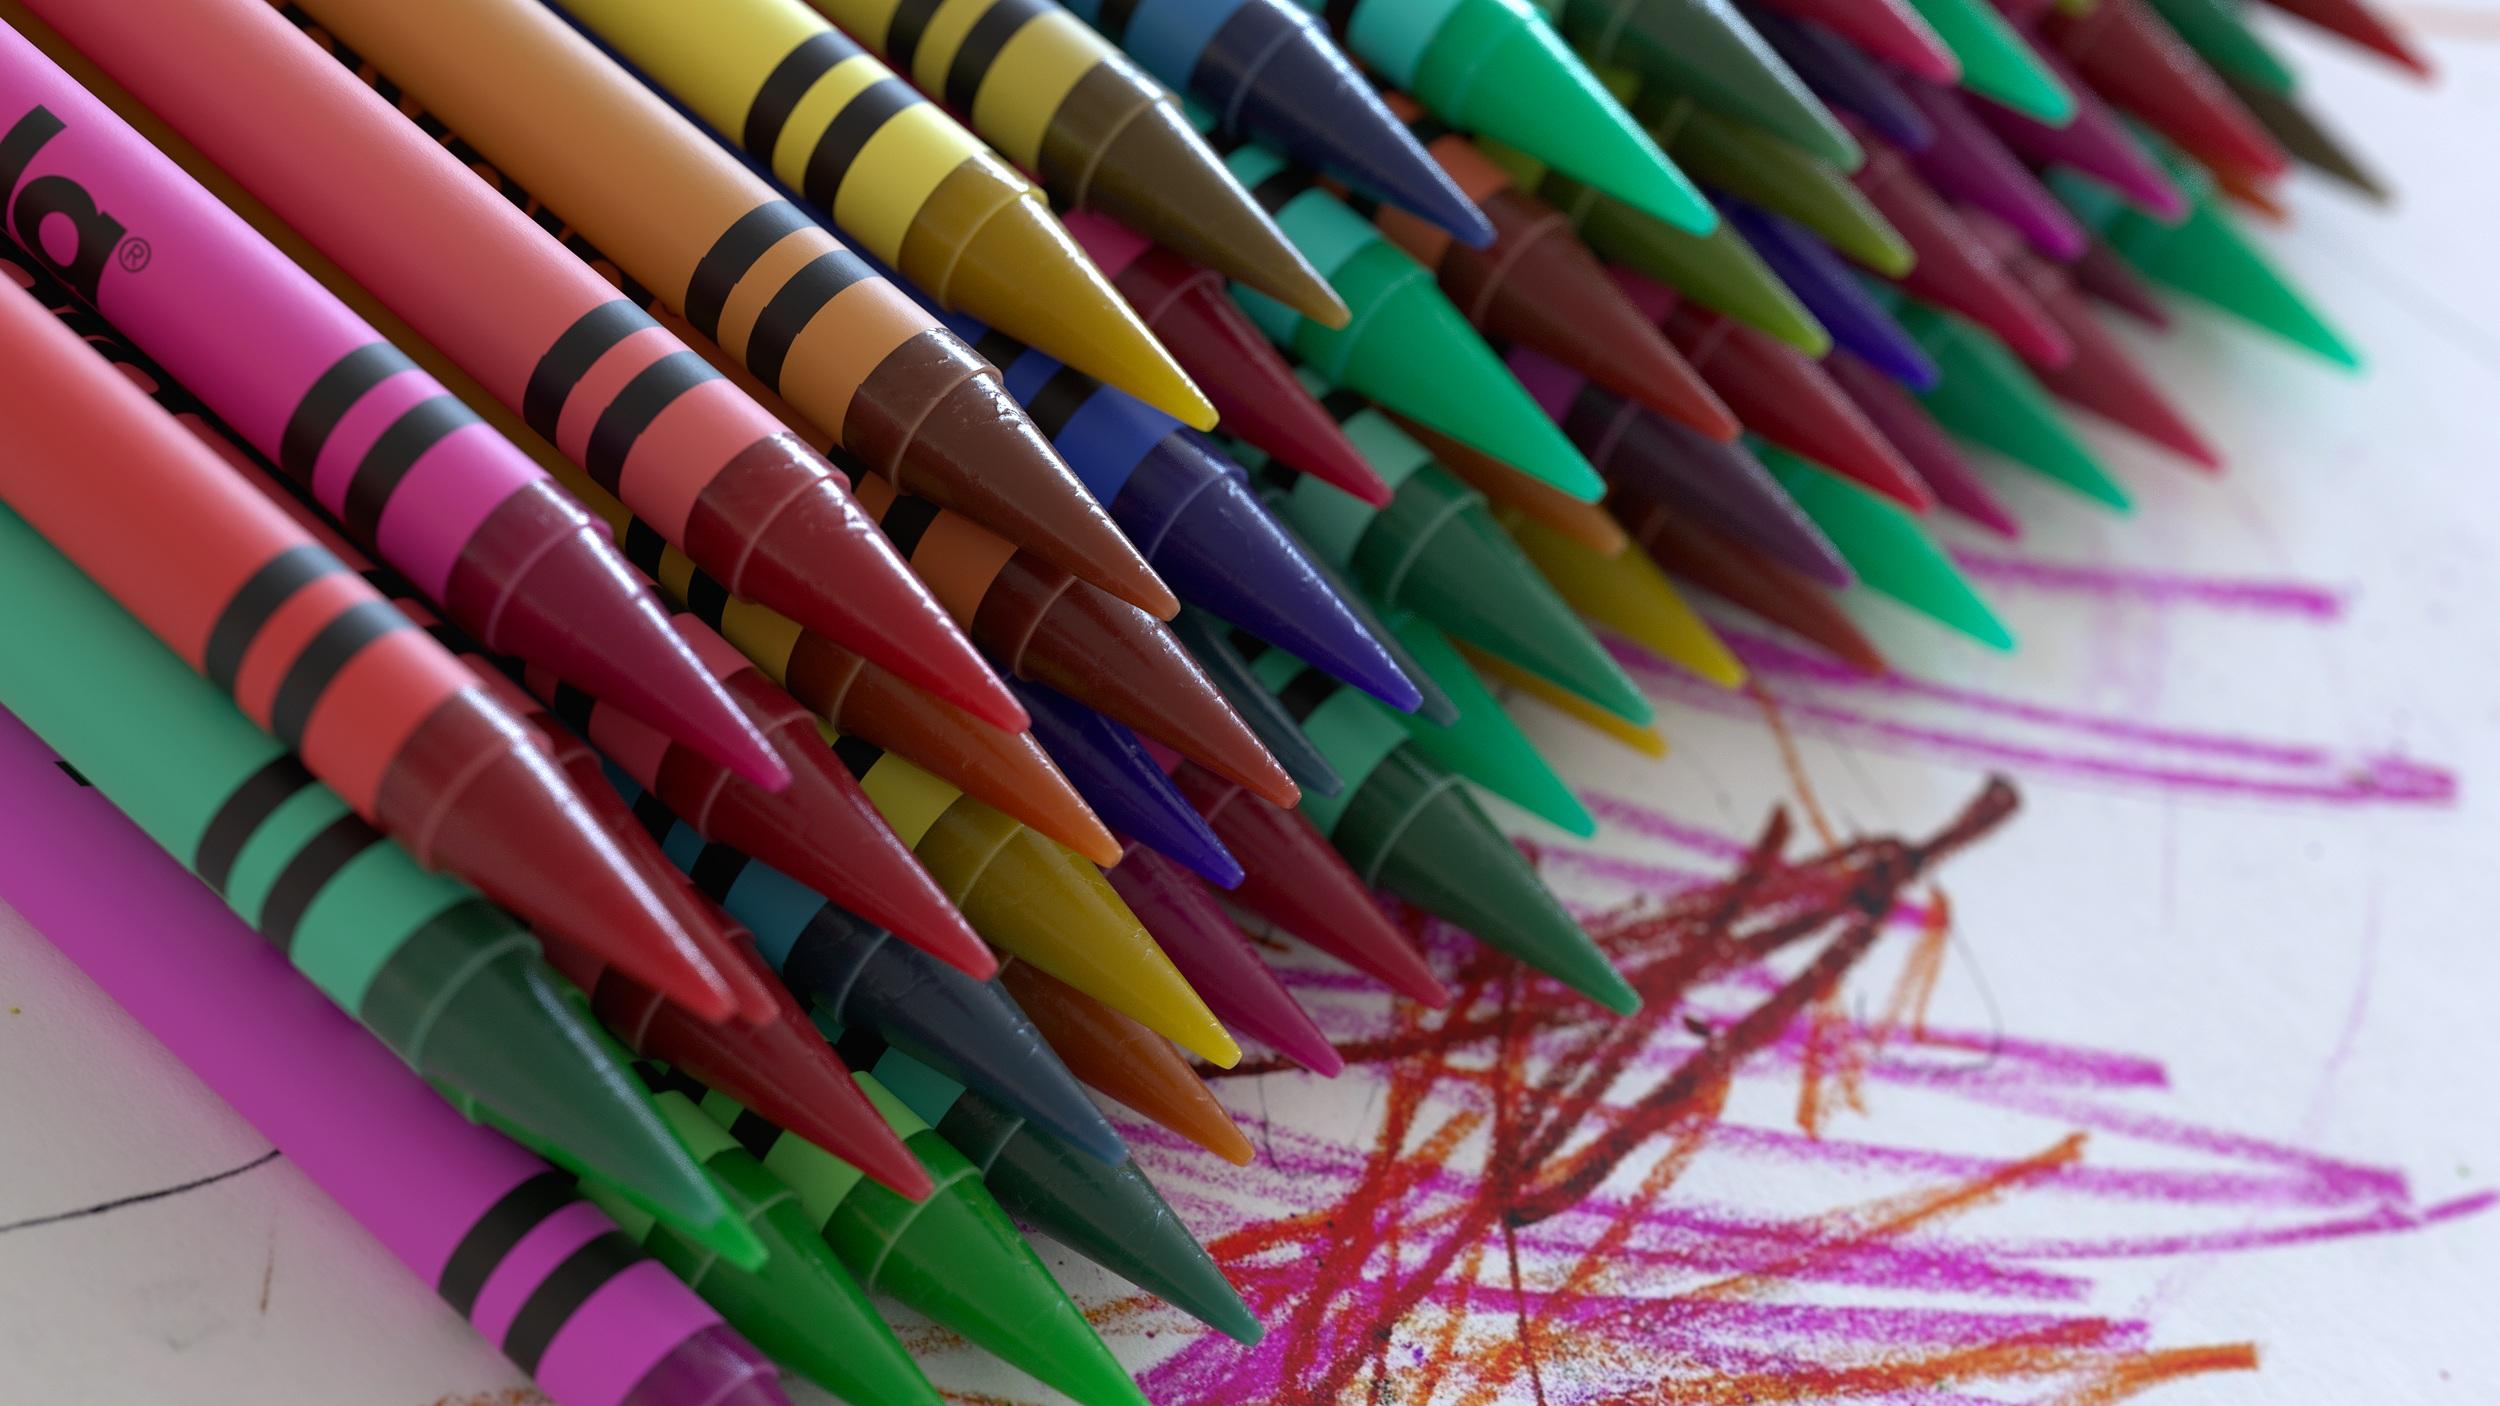 Crayons+Many+4.jpg